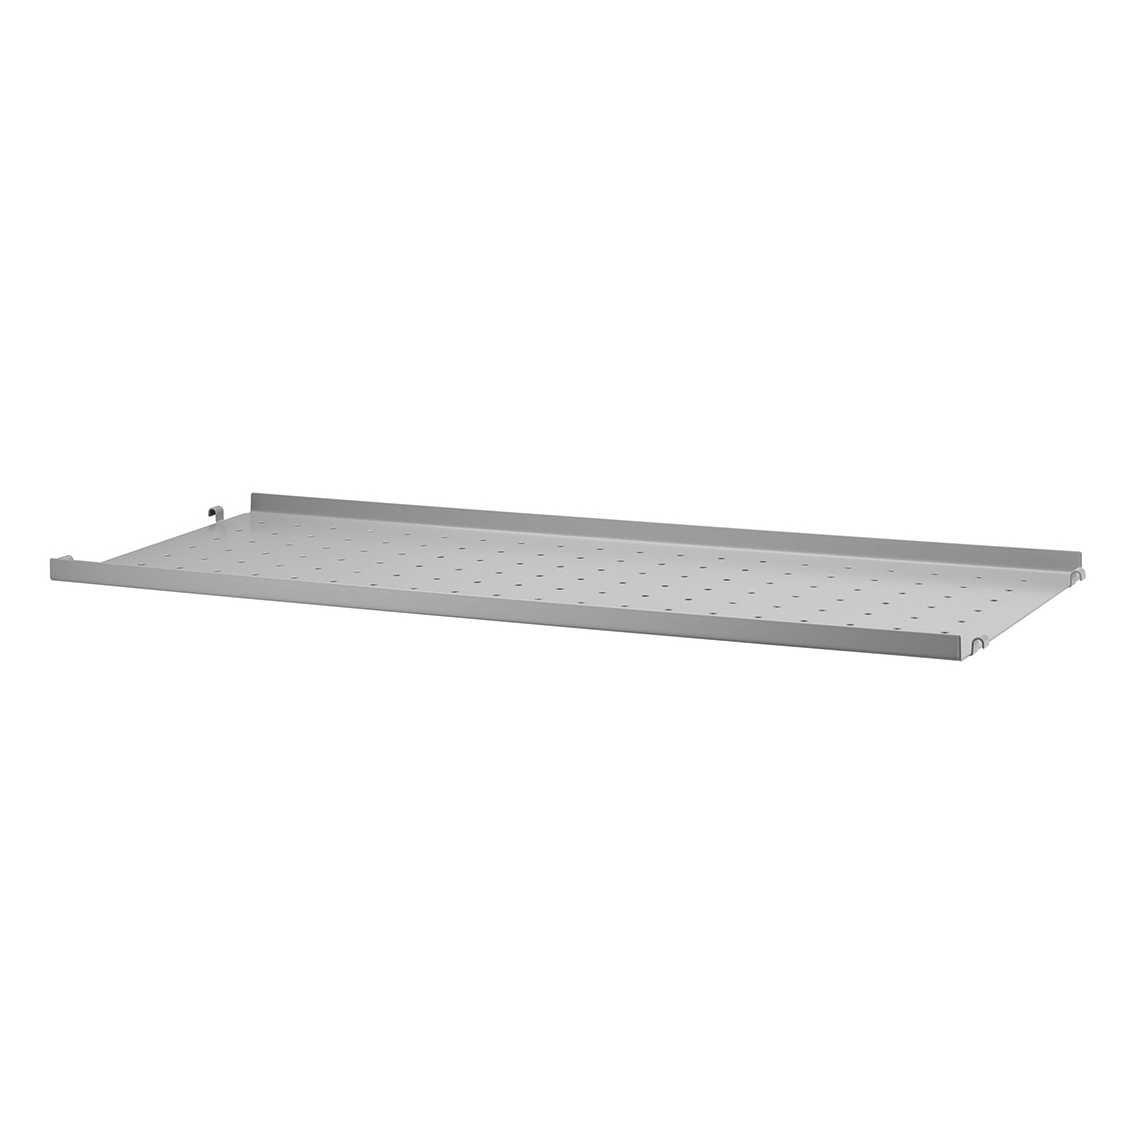 String Metal Shelf Low Edge 78 x 20 cm. - Grijs